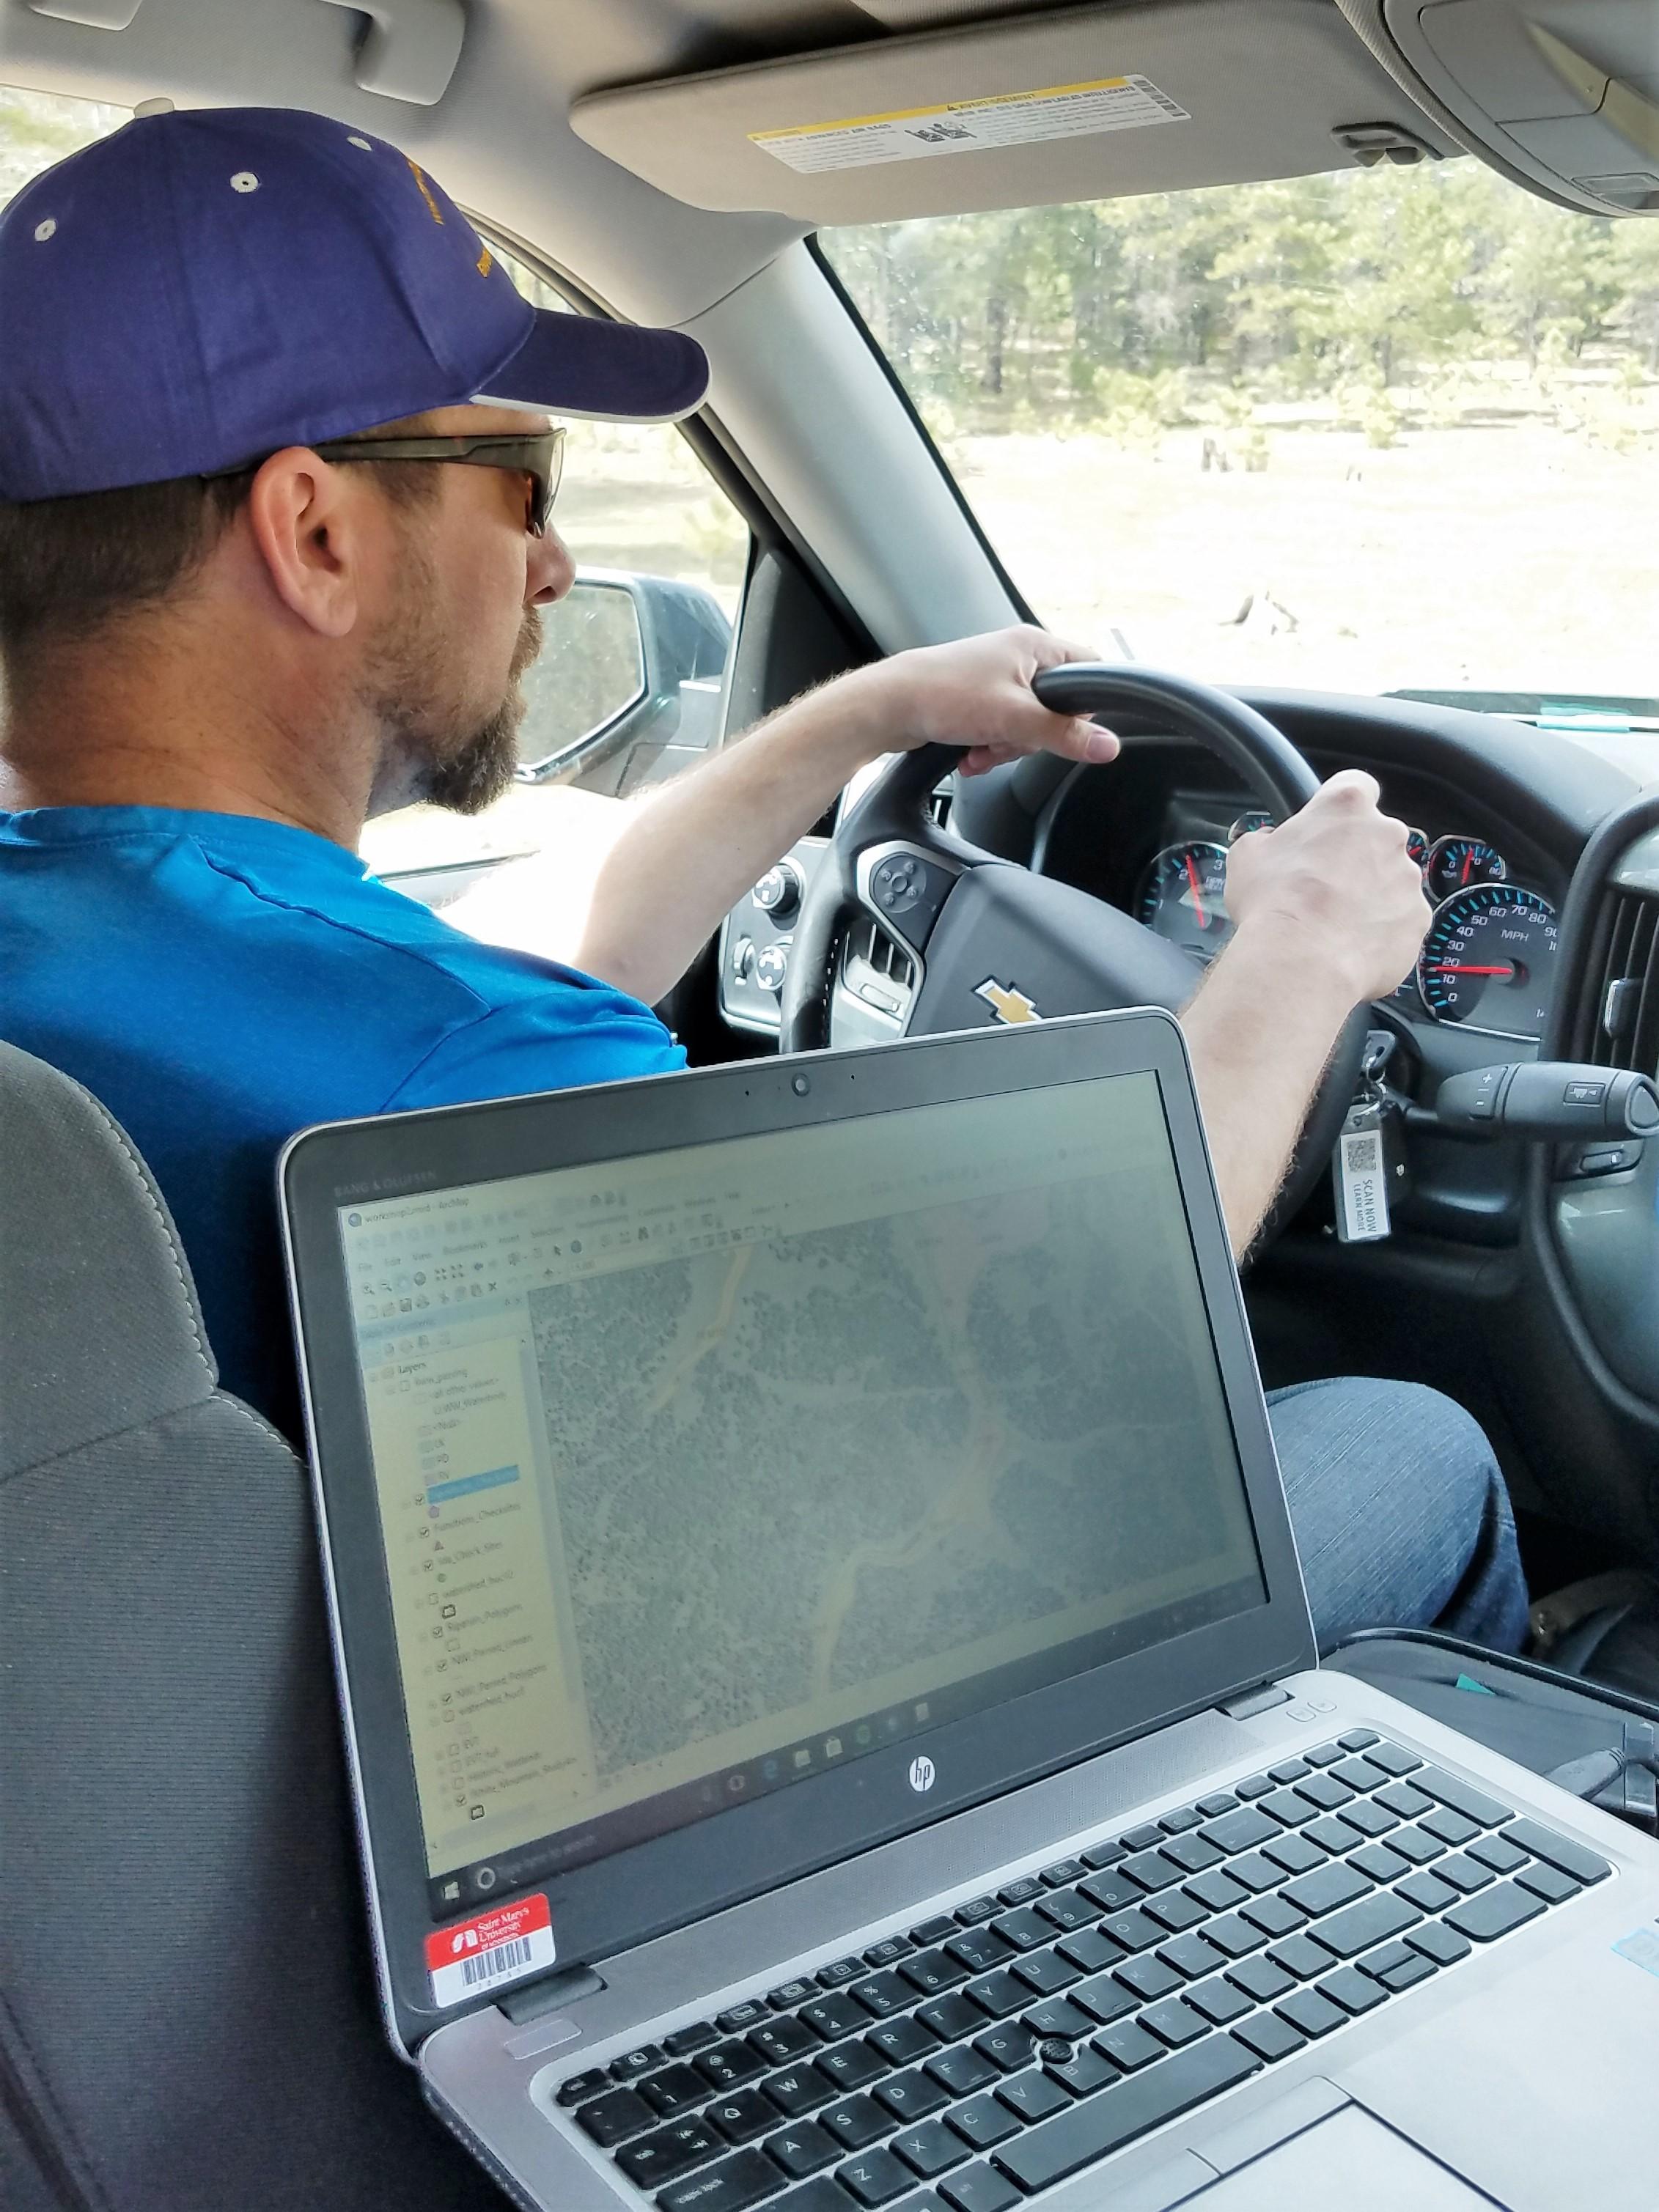 Stark_computer_driving.jpg